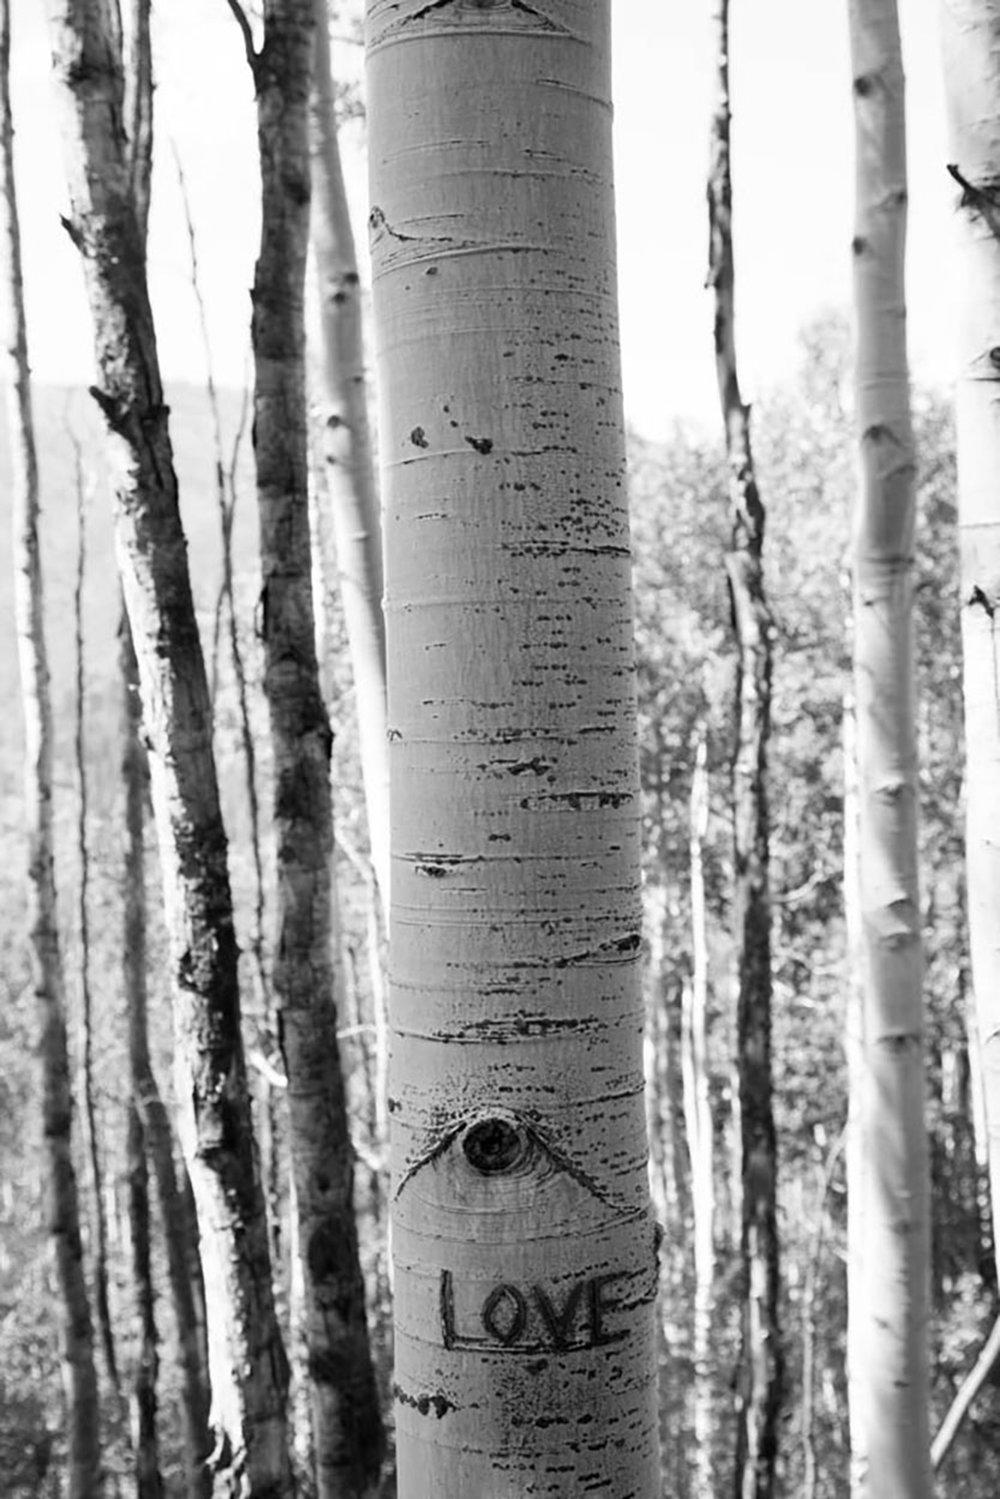 Love-tree.jpg